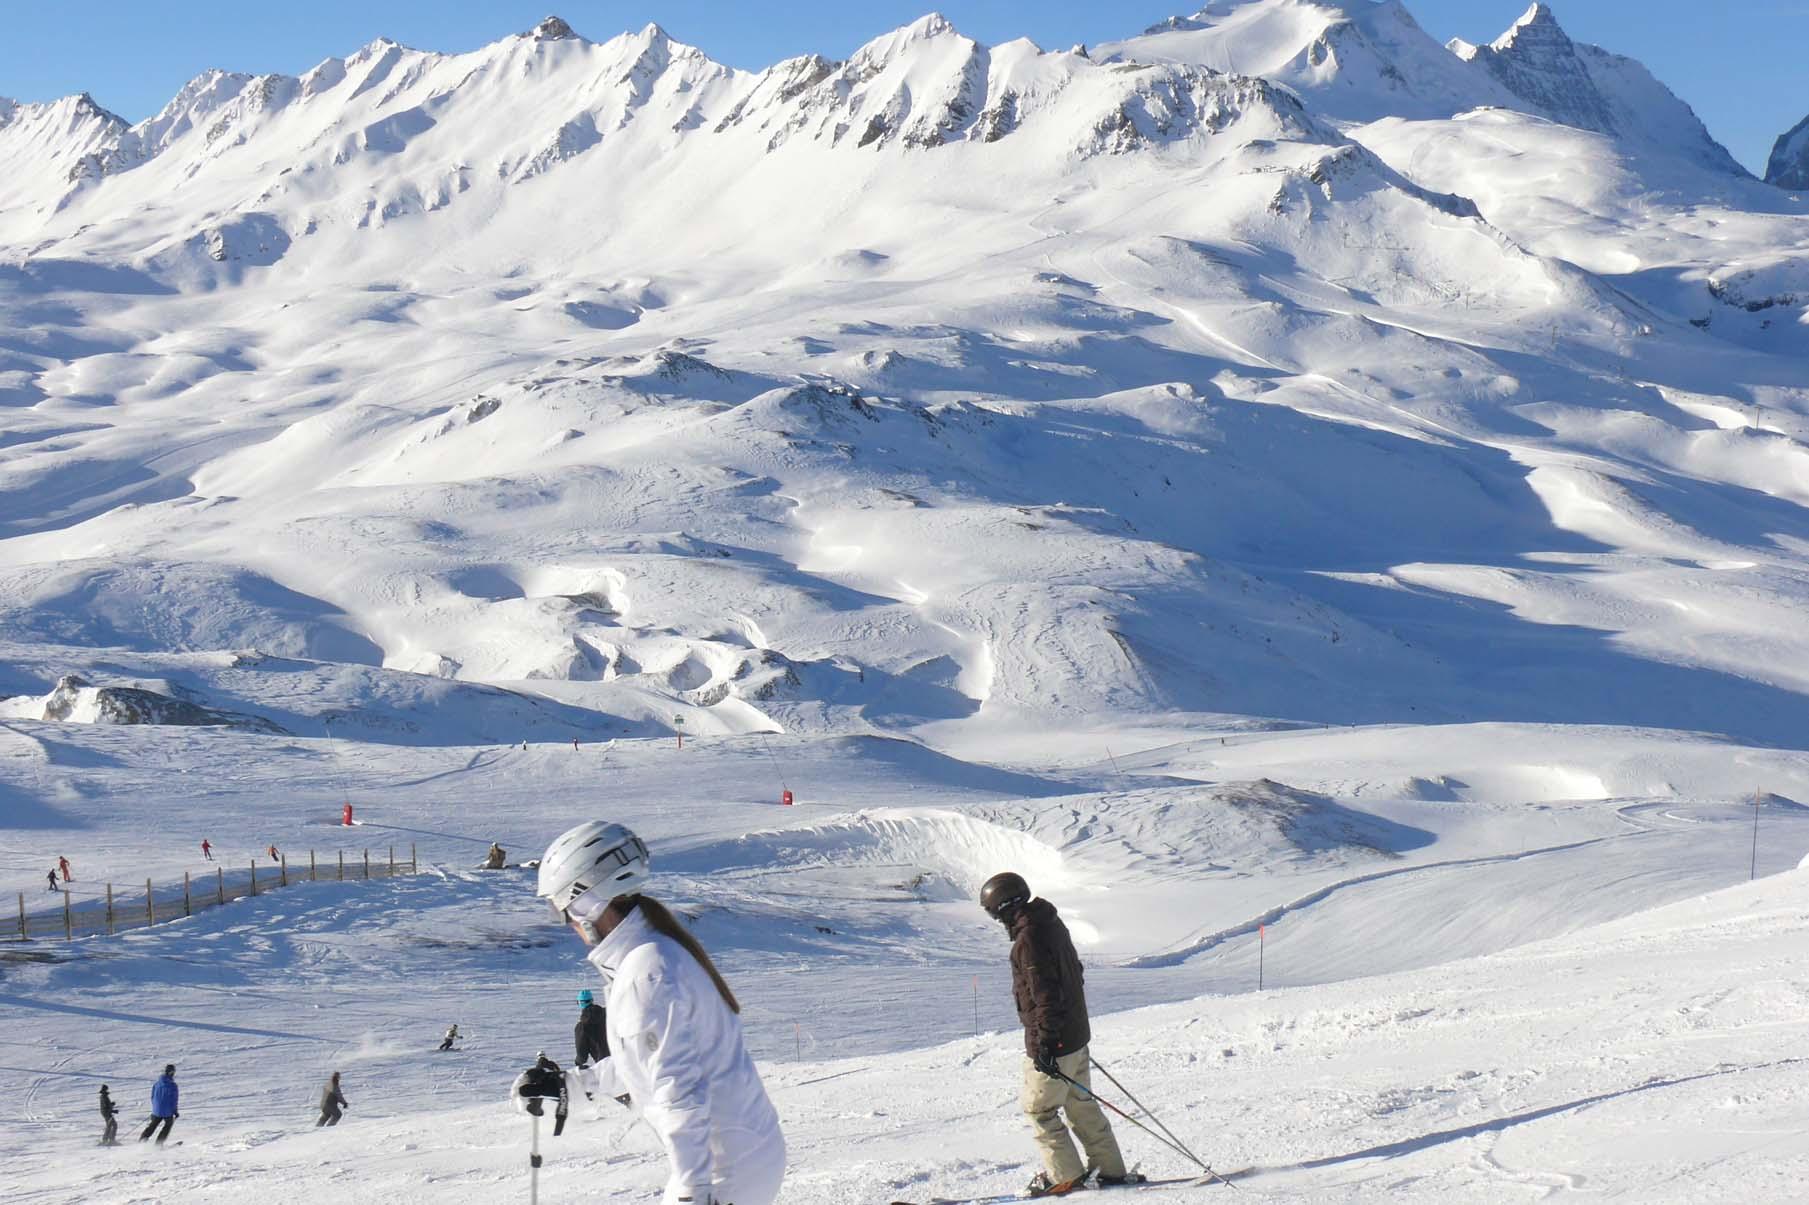 Val d'Isere slopes